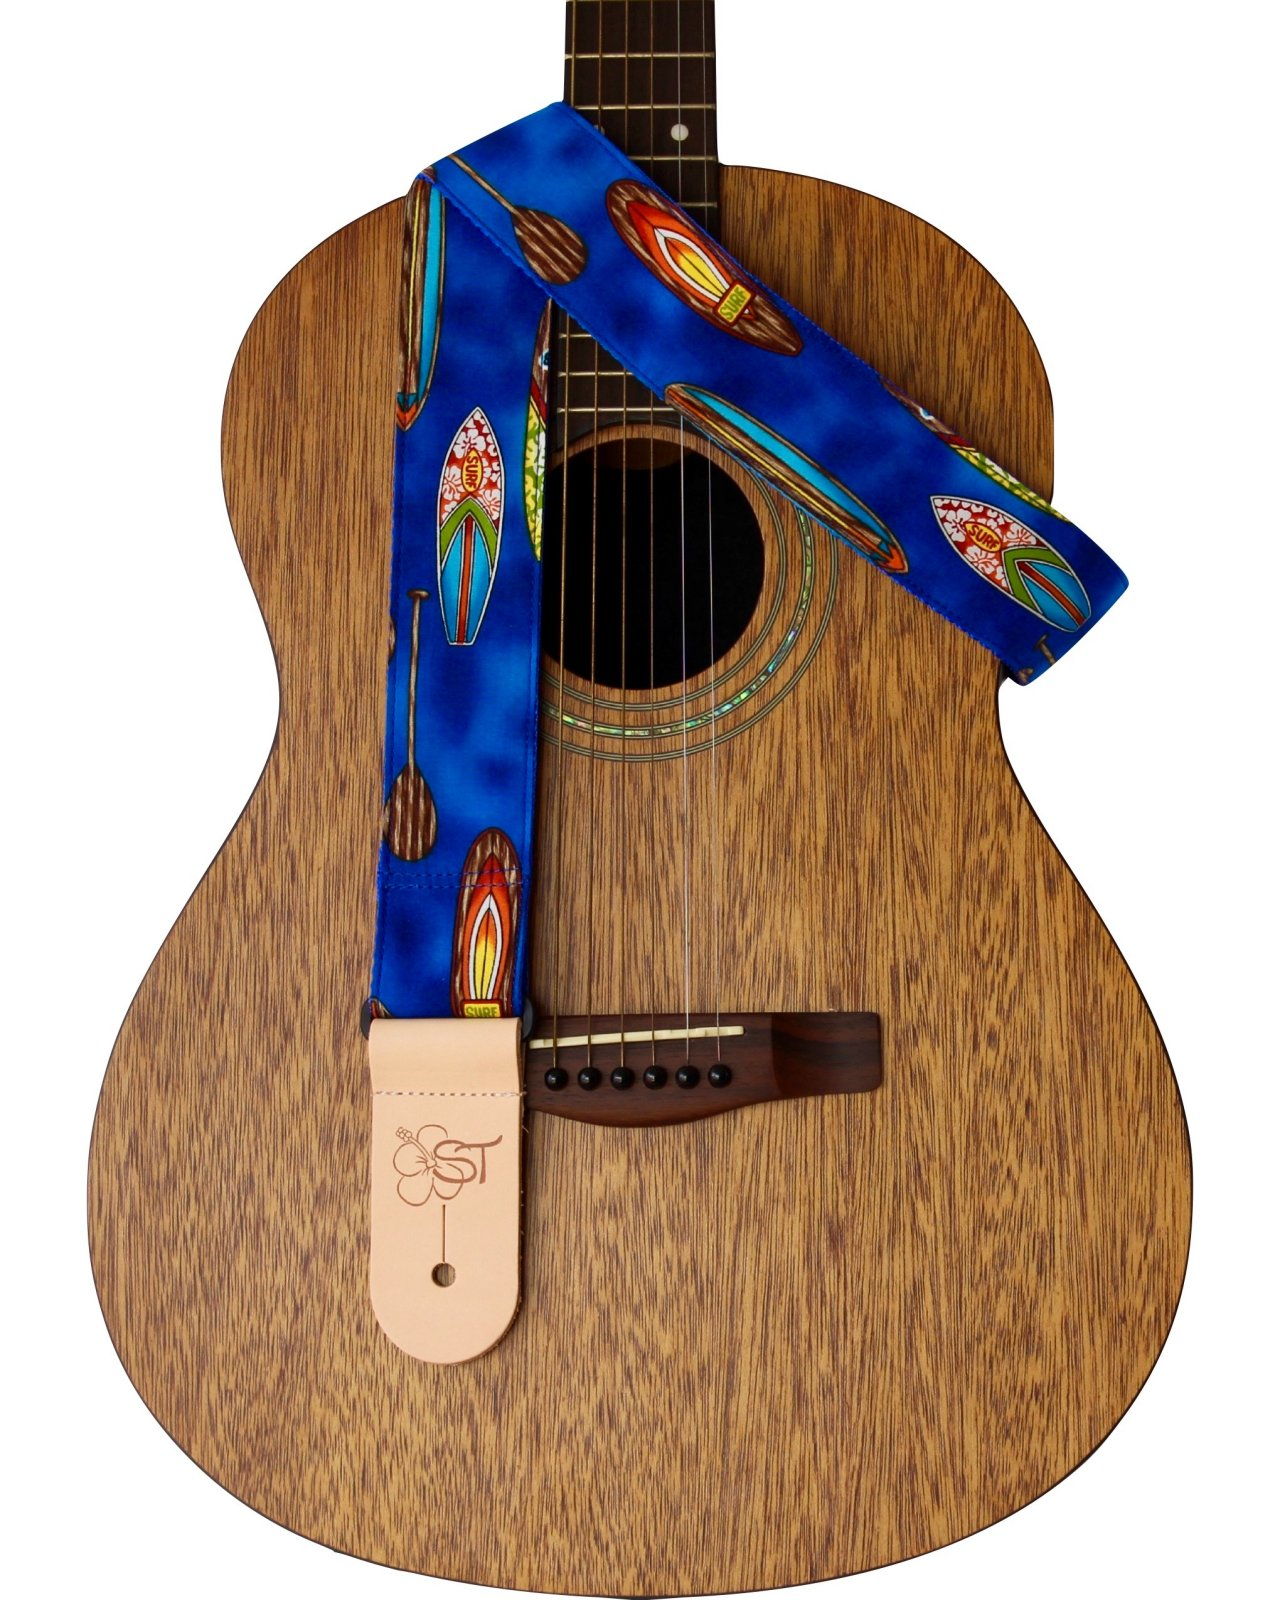 ST 2 Hawaiian Print Guitar Strap - Blue Surfboard